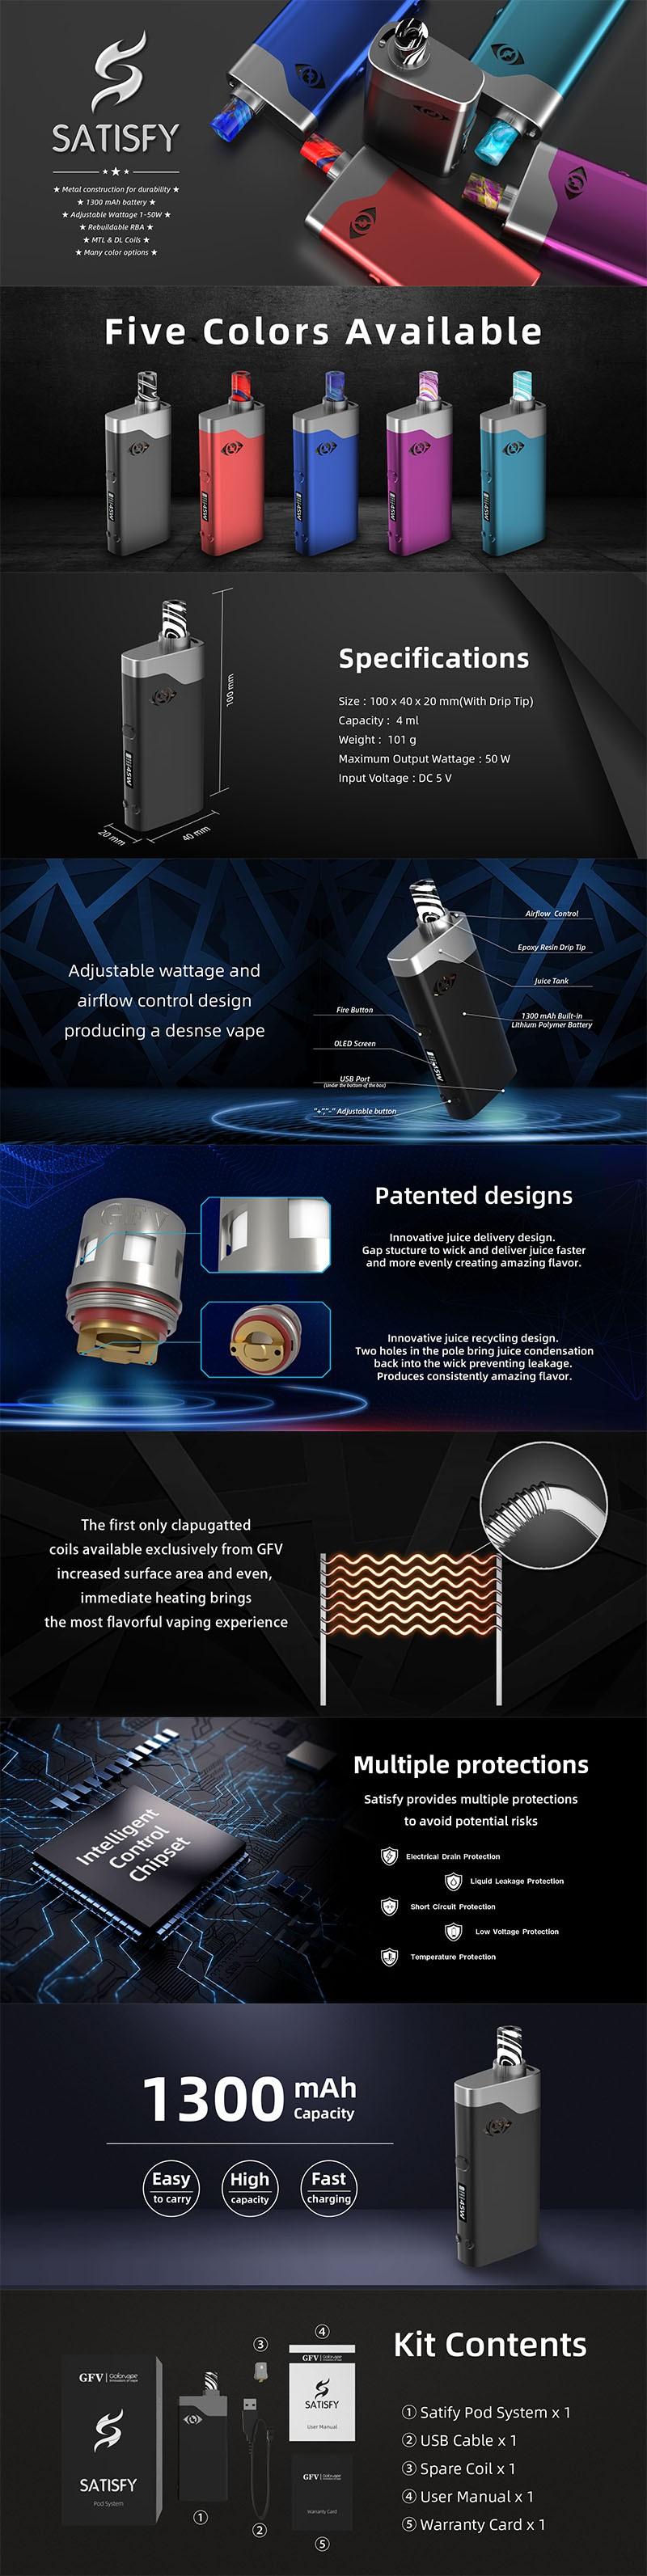 Goforvape Satisfy 50W 1300mAh VW Variable Voltage Box Mod Pod System Starter Kit